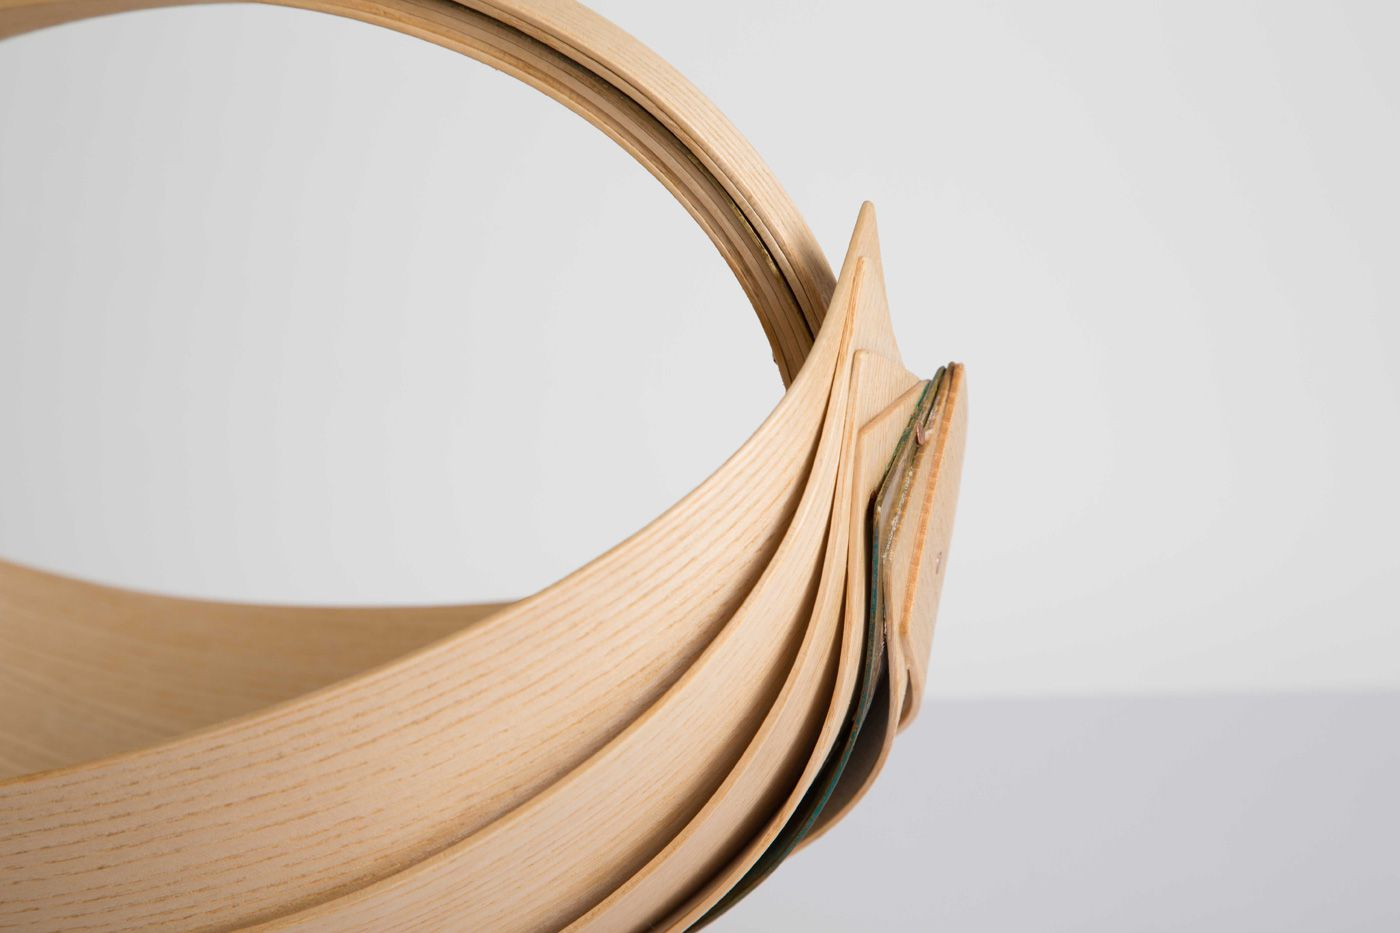 Steam-bent basket by Jane Crisp